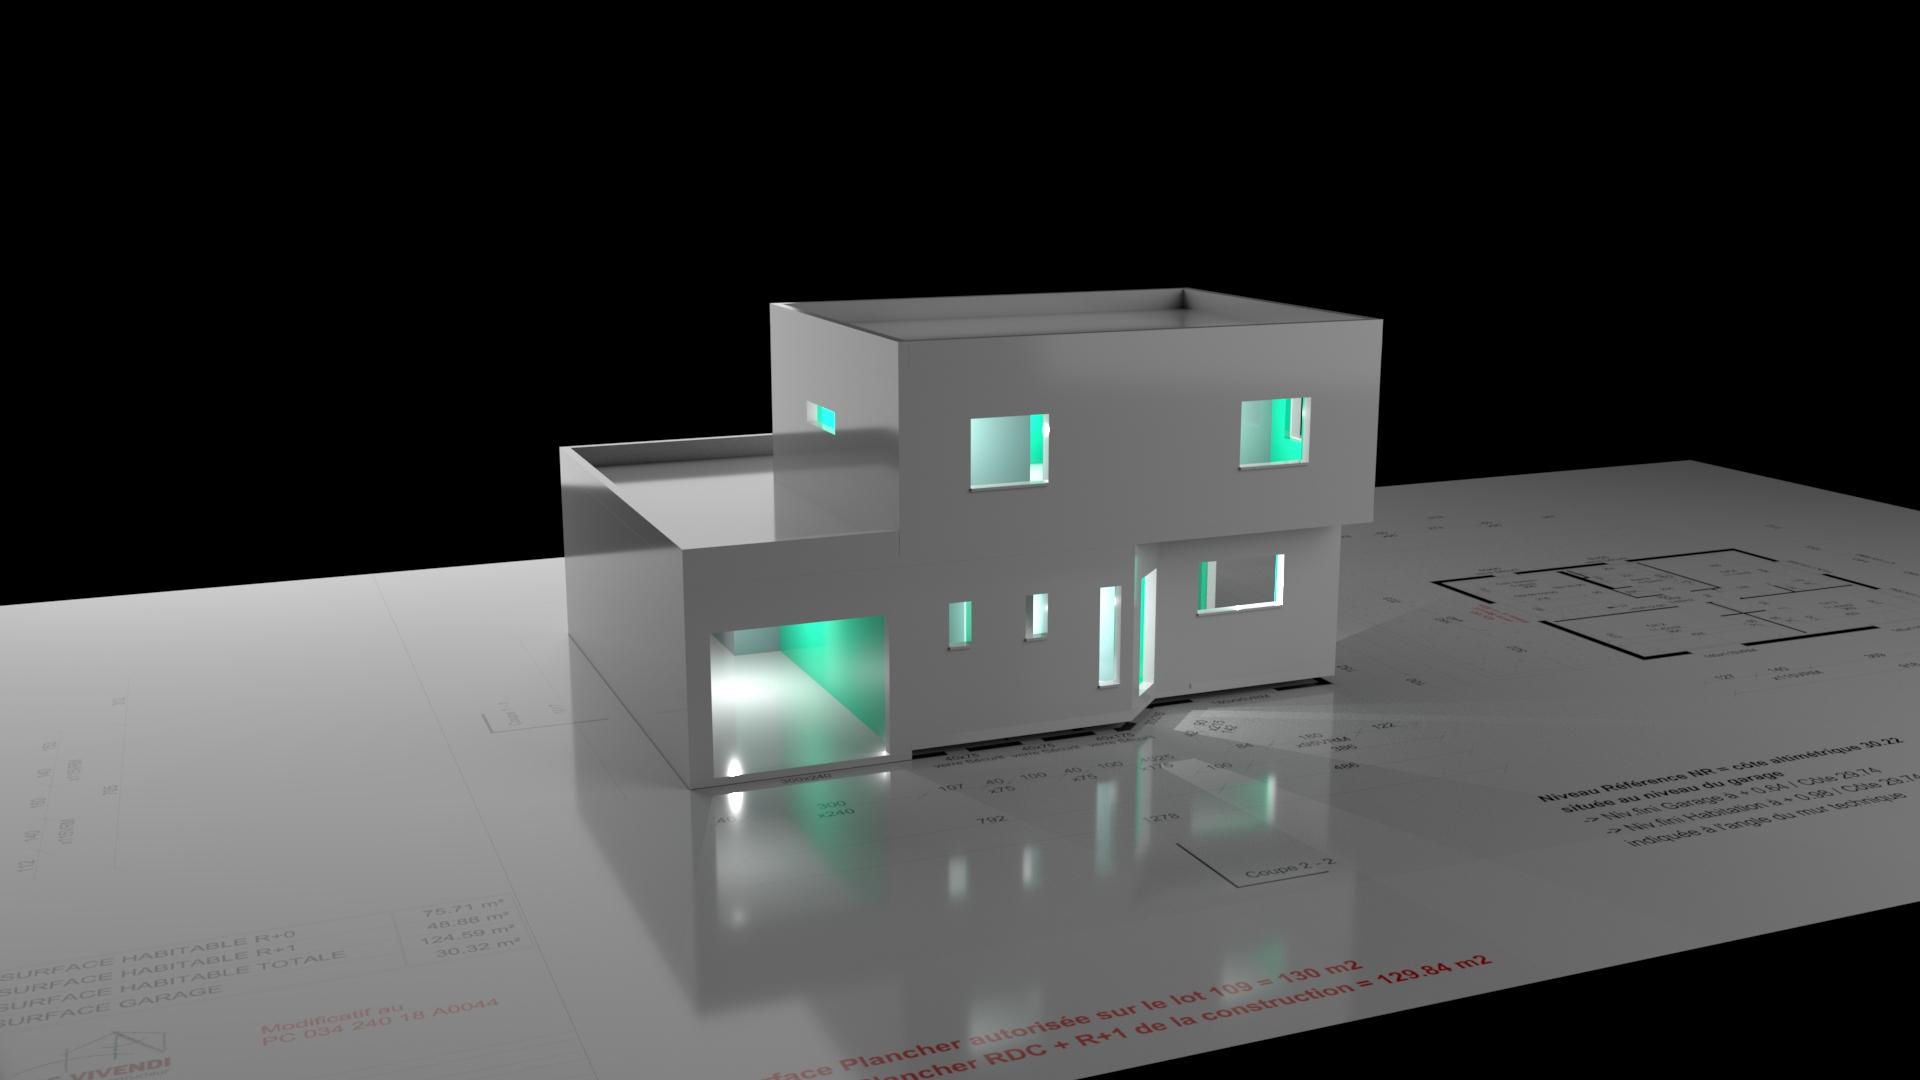 modelisation 3d realite virtuelle montpellier d light production plan3